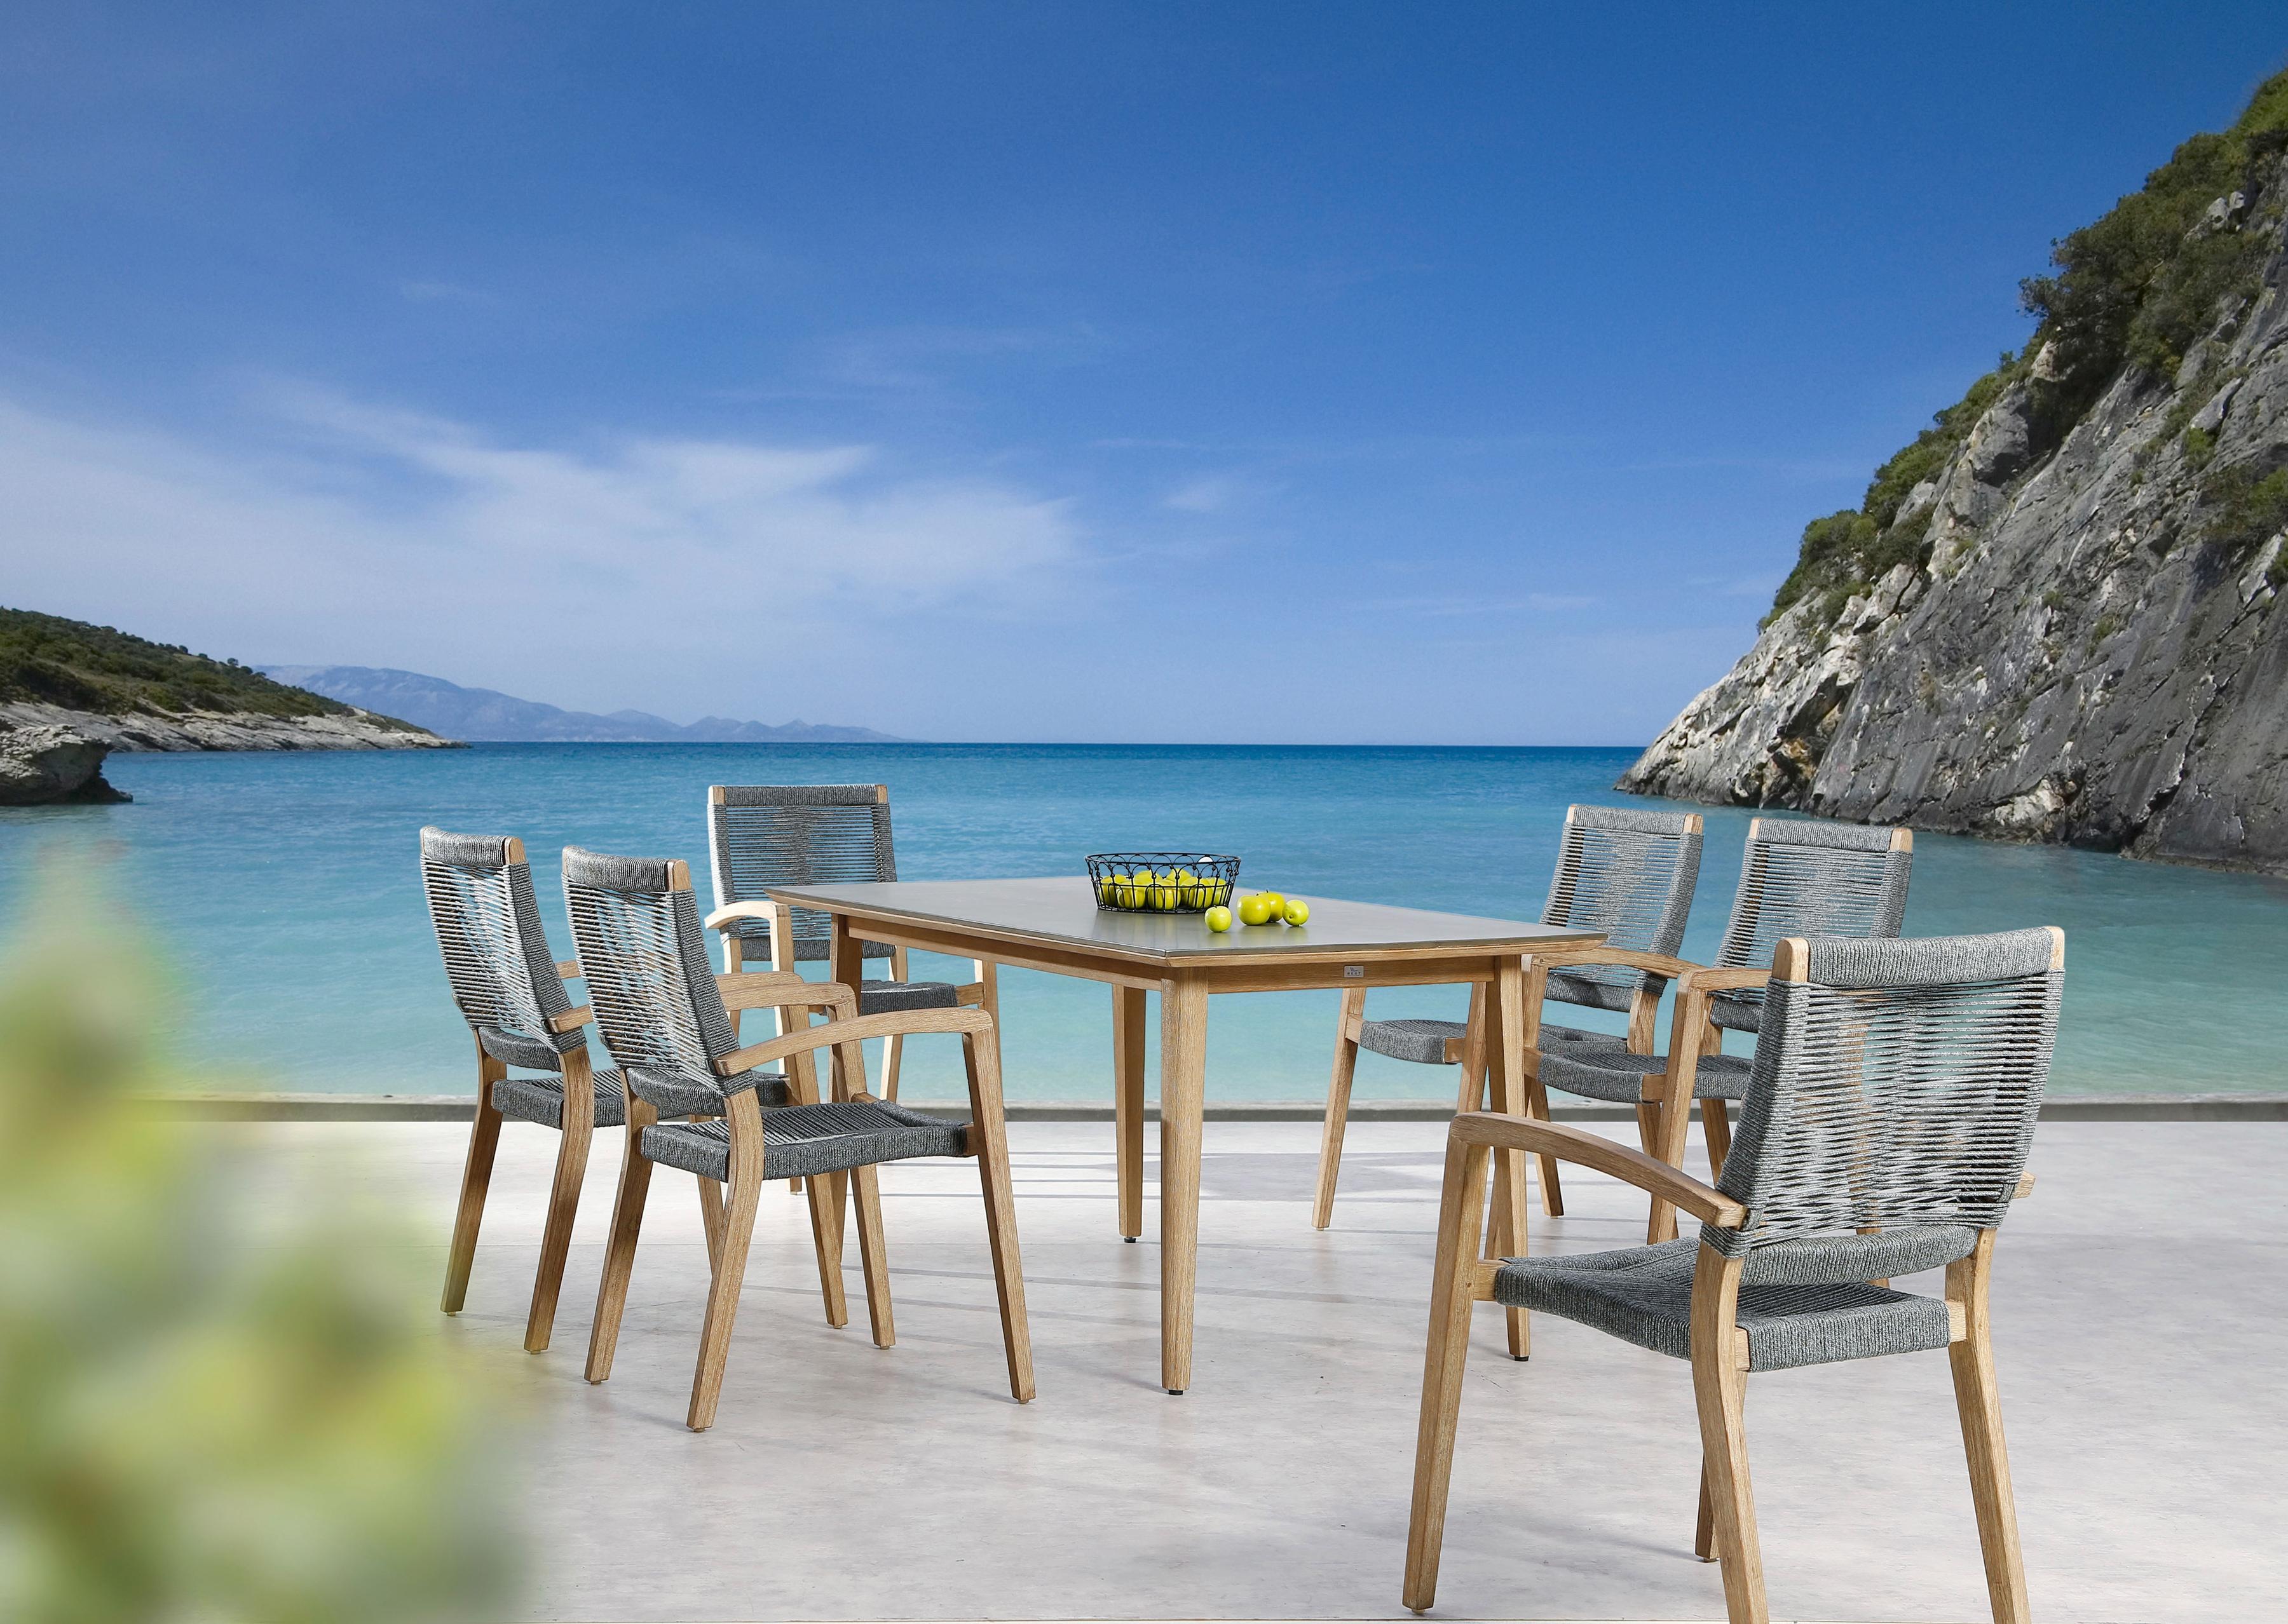 BEST Gartenmöbelset Lagos 7-tlg 6 Sessel Tisch 170x90 cm Alumimium